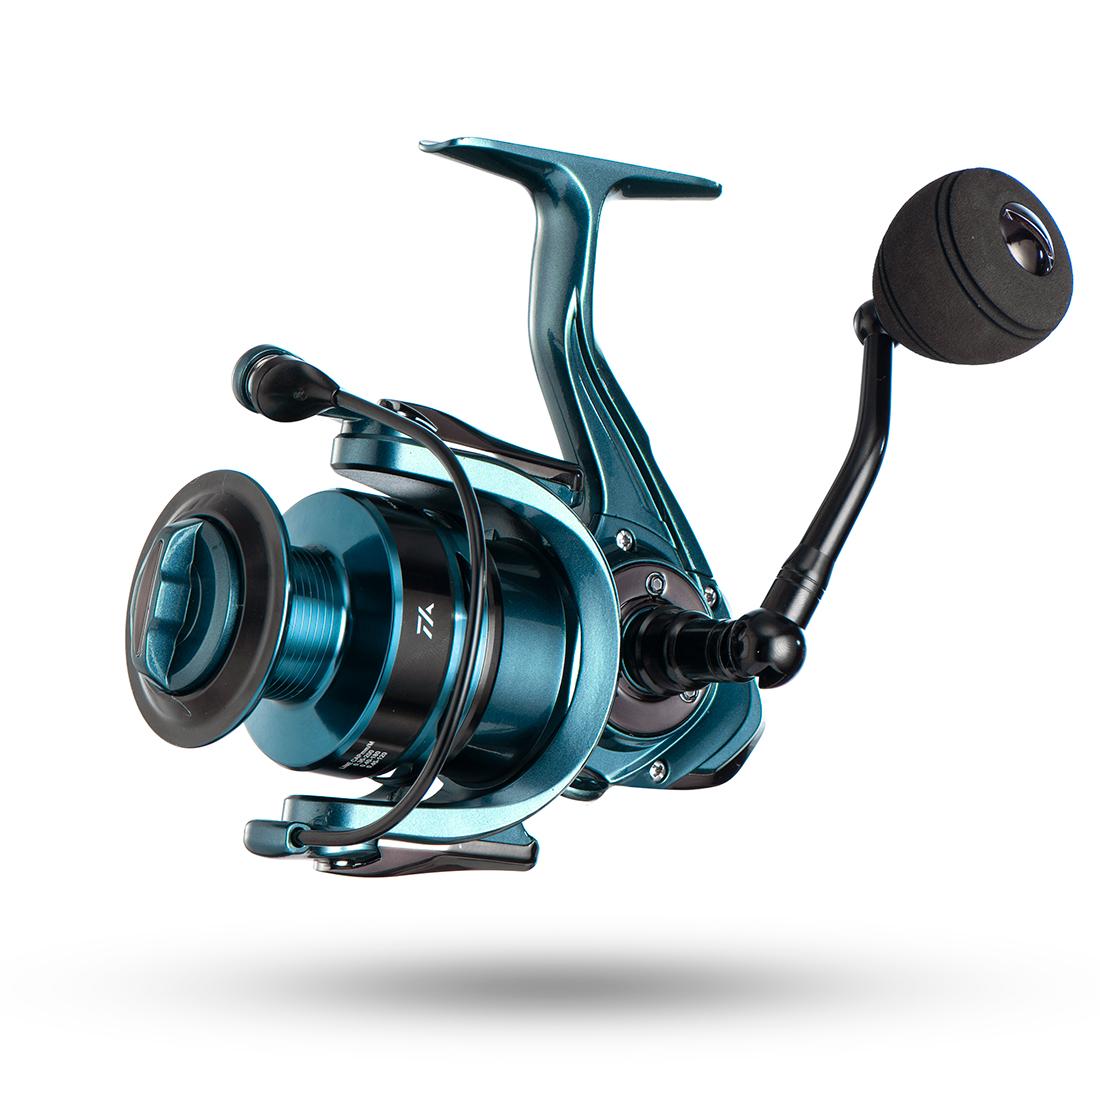 Fishing Reel 14+1BB Deep Spool 5.5:1 4.7:1 Gear Ratio High Speed Spinning Reel Casting reel Carp For Saltwater 7000 D deep cup